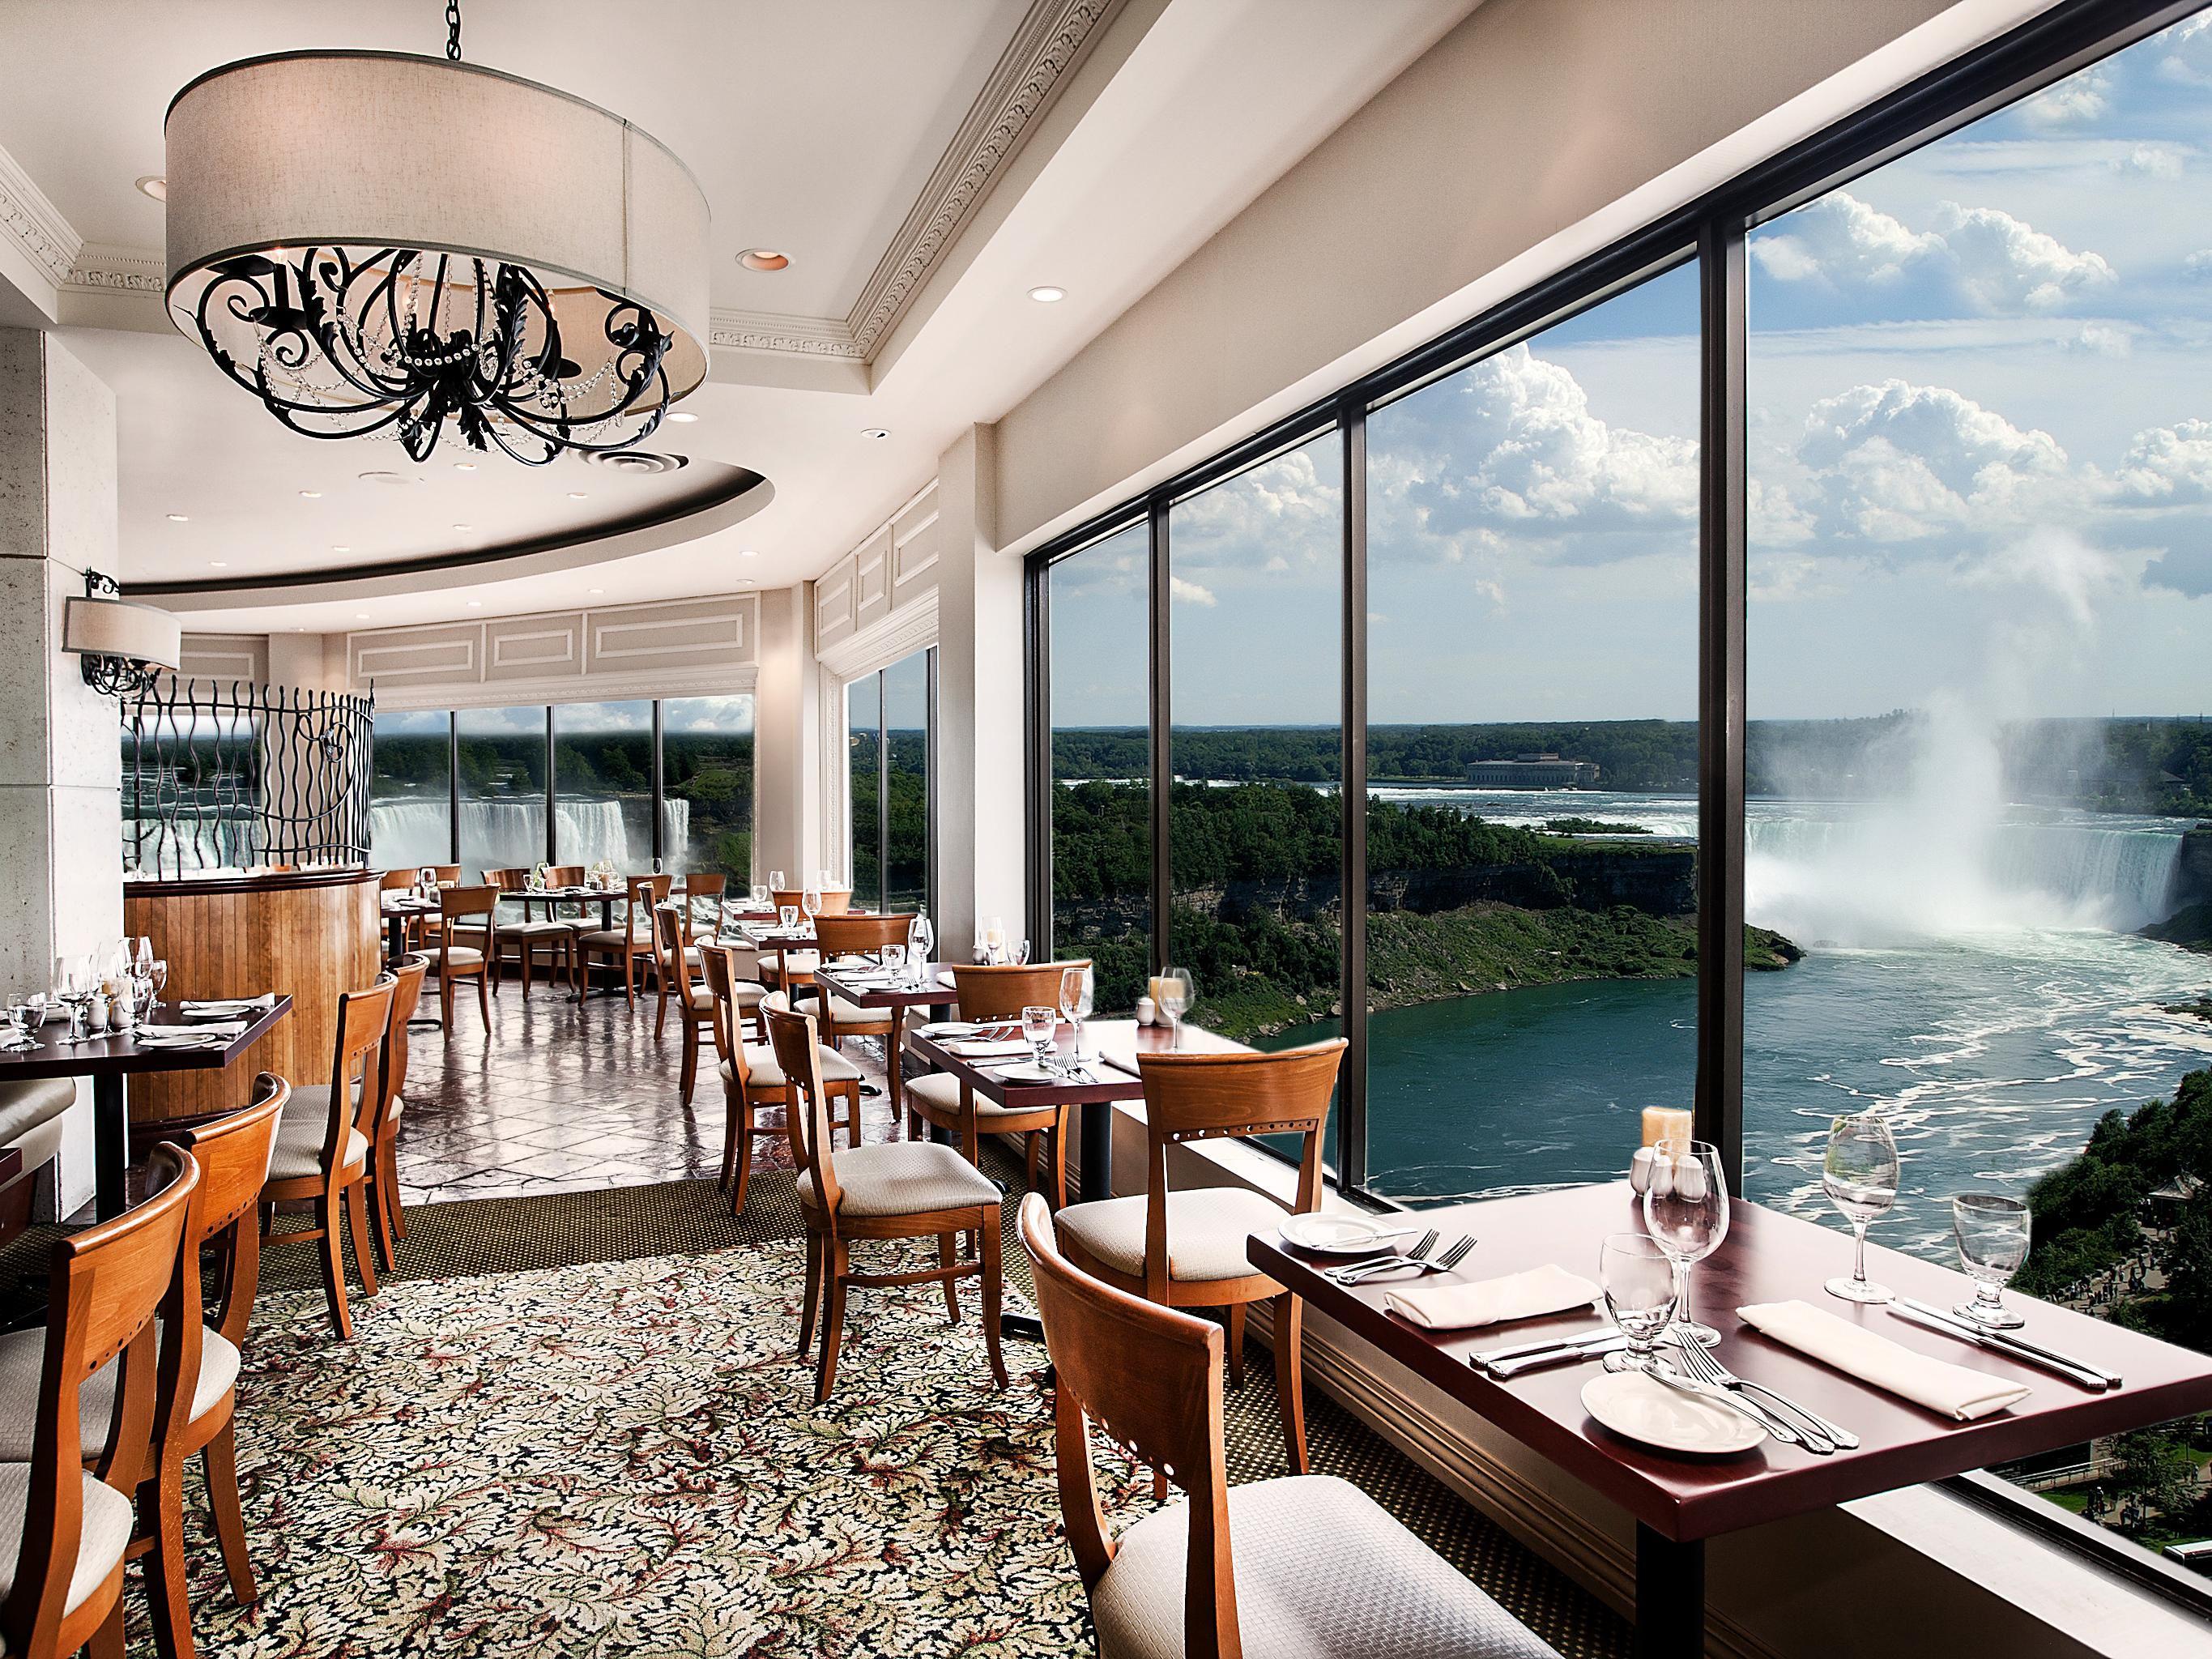 Restaurant Photo Prime Steakhouse Overlooking Niagara Falls